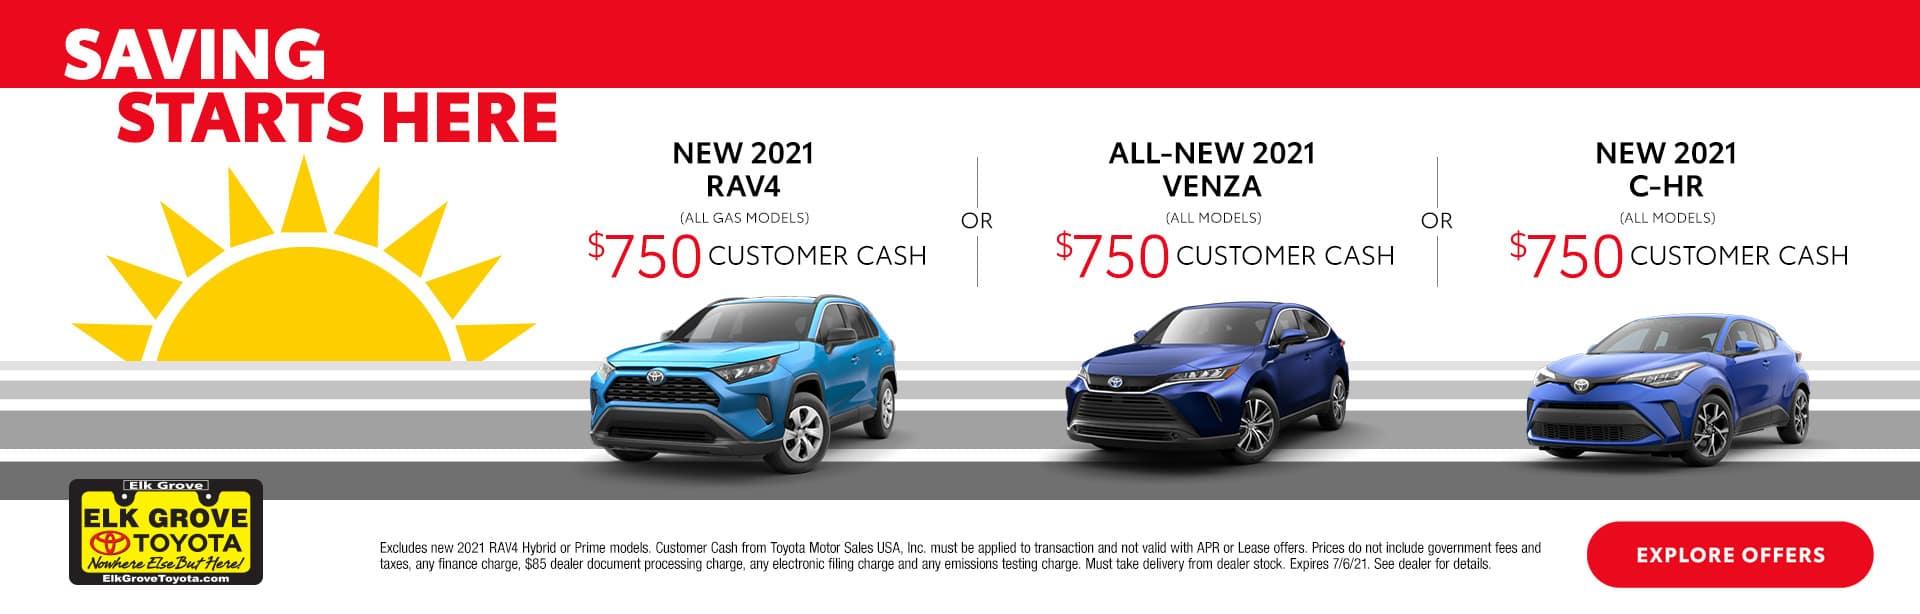 Saving Starts Here - 2021 Venza